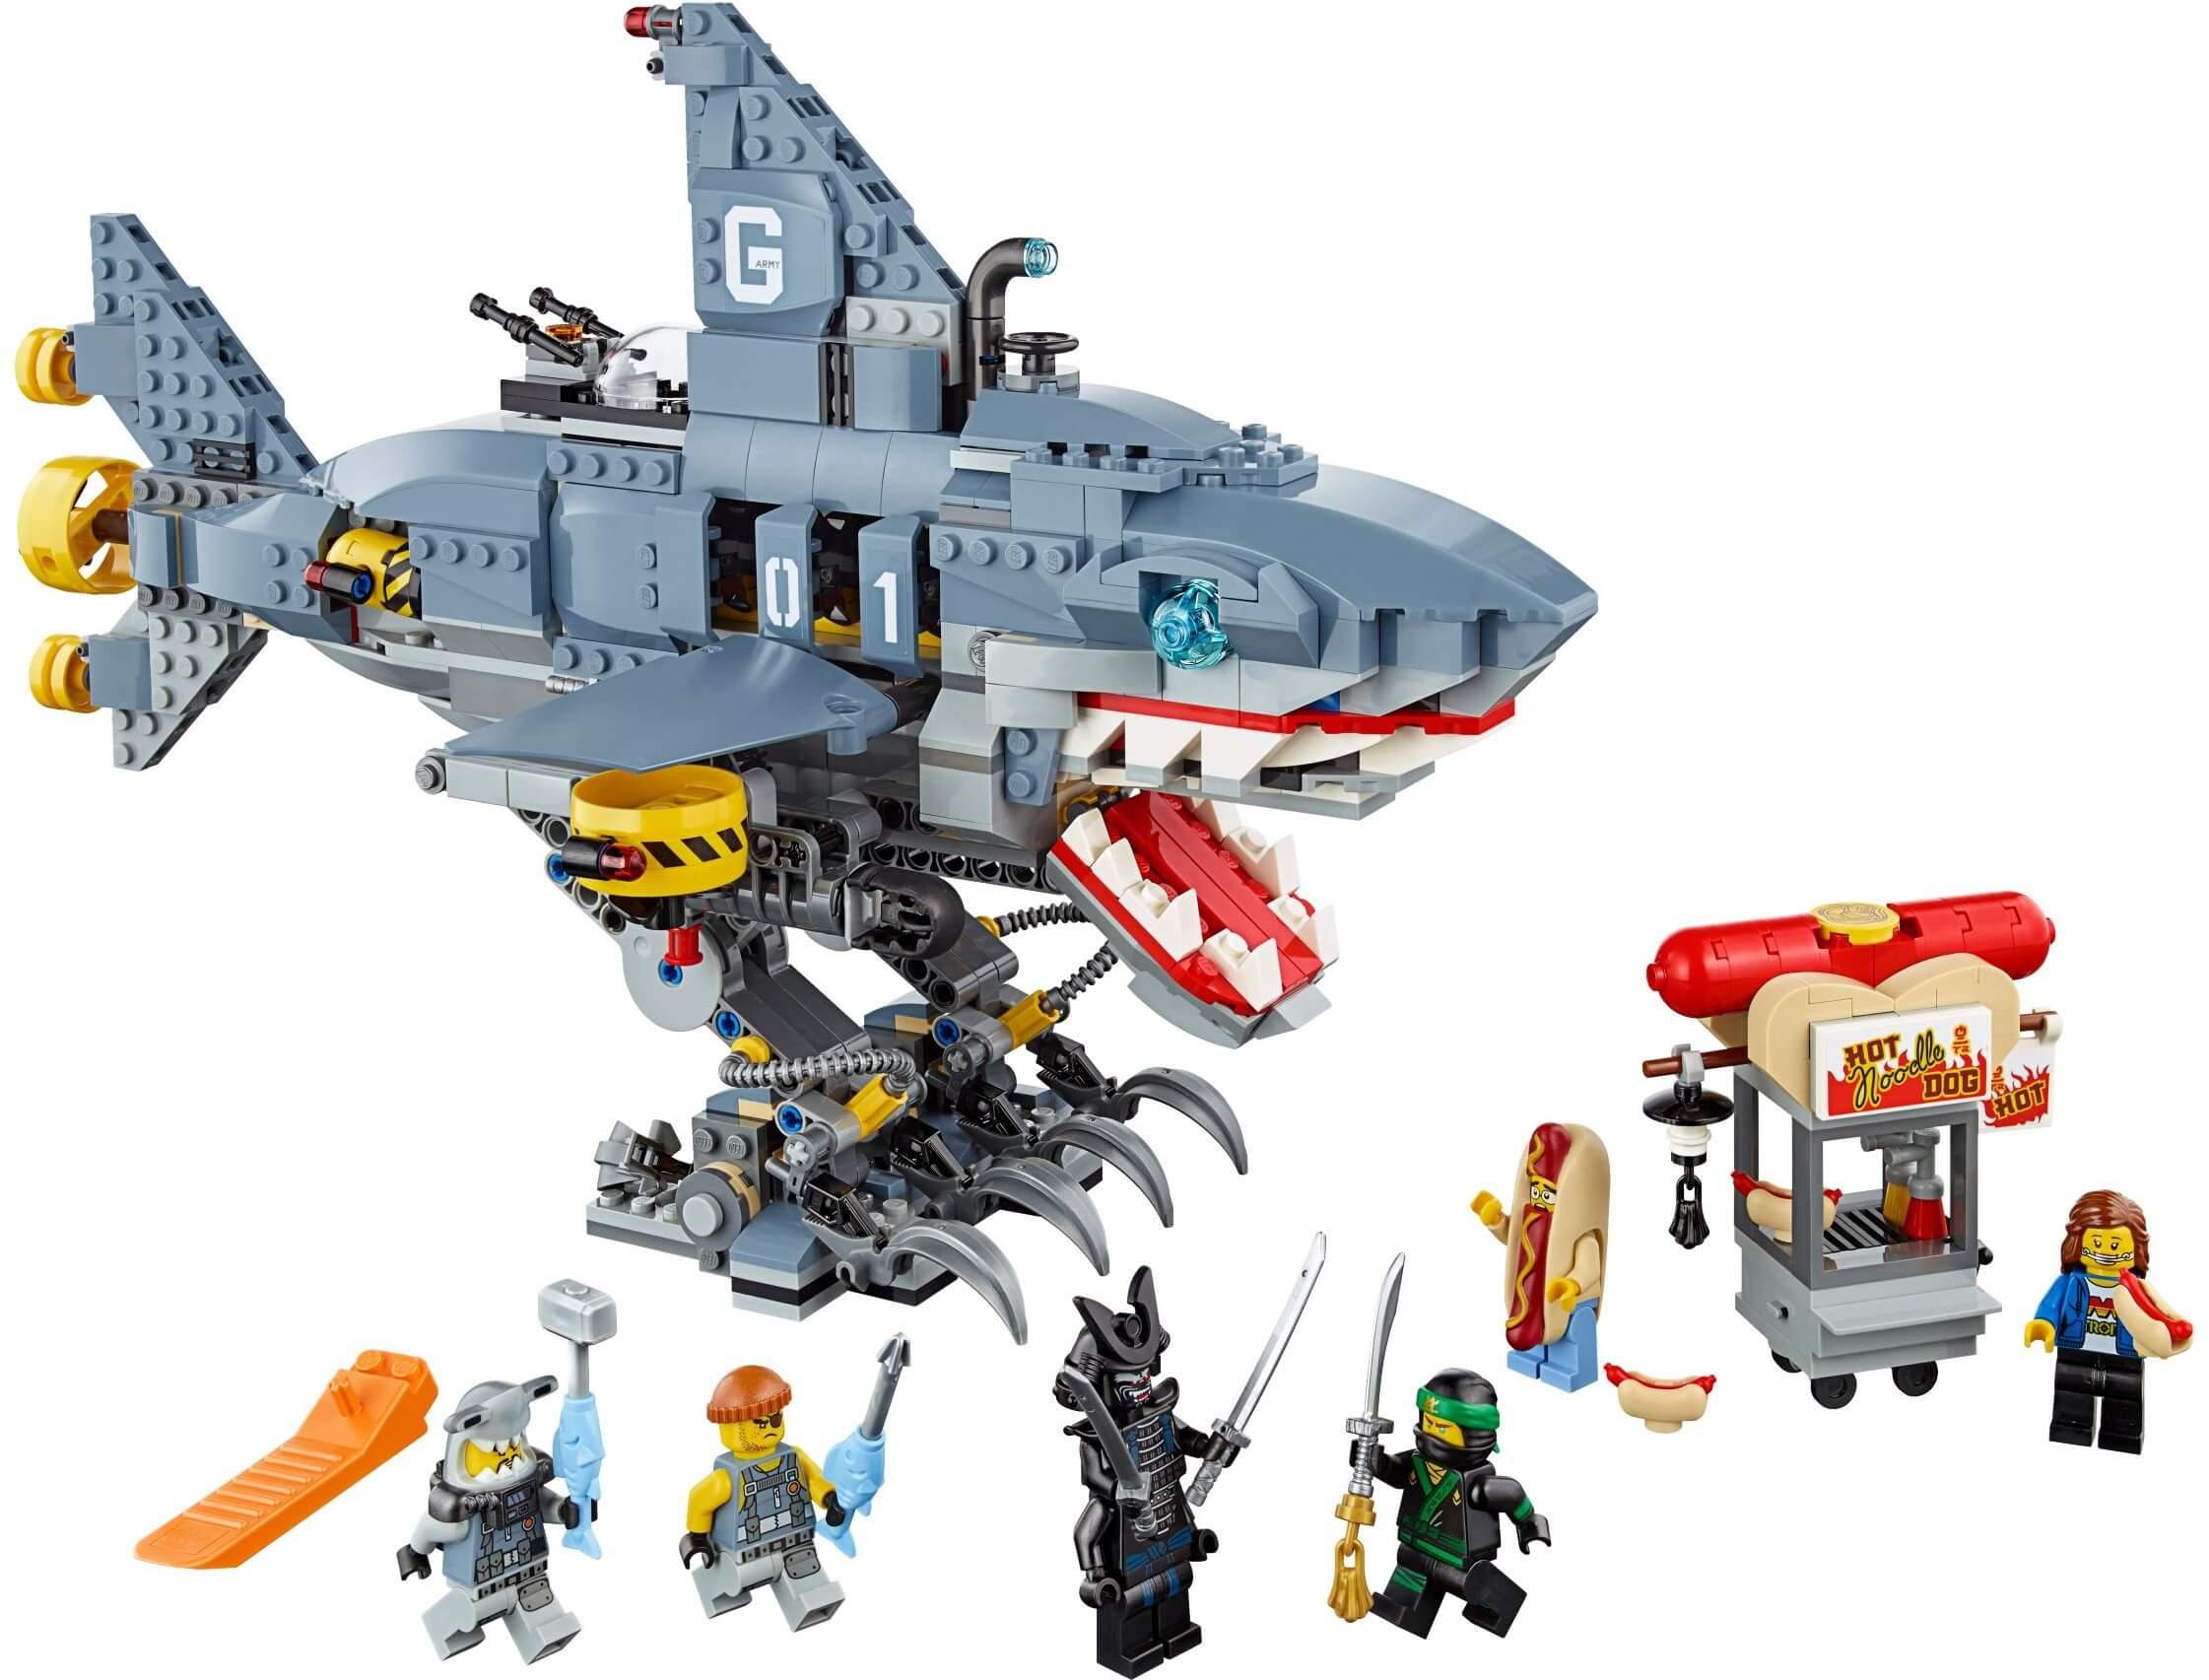 Mua đồ chơi LEGO 70656 - LEGO Ninjago 70656 - Tàu Ngầm Cá Mập Garmadon (LEGO Ninjago 70656 garmadon, Garmadon, GARMADON!)